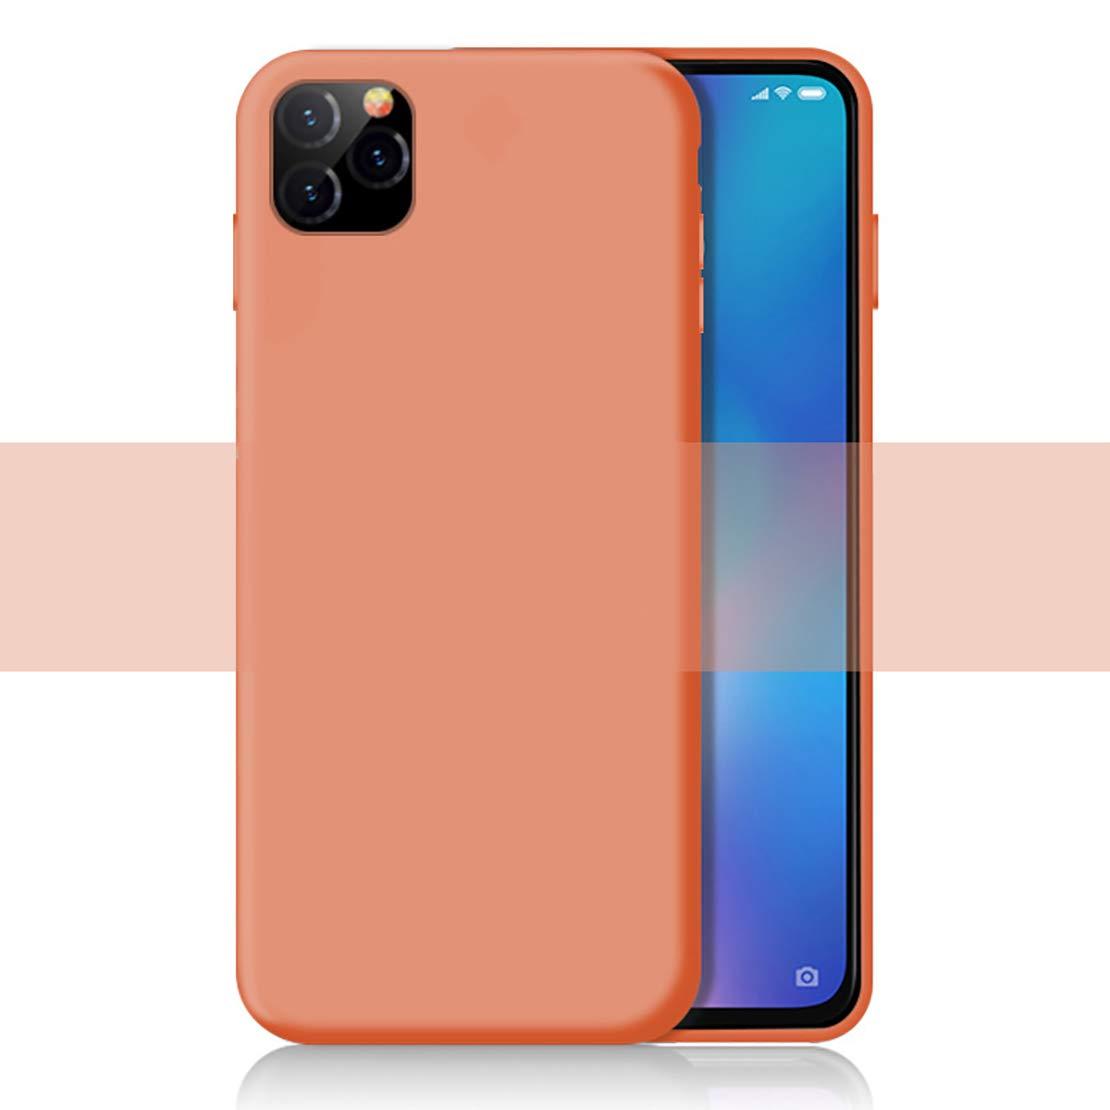 Funda Iphone 11 Pro Max LY LANYOS [7X623YCN]